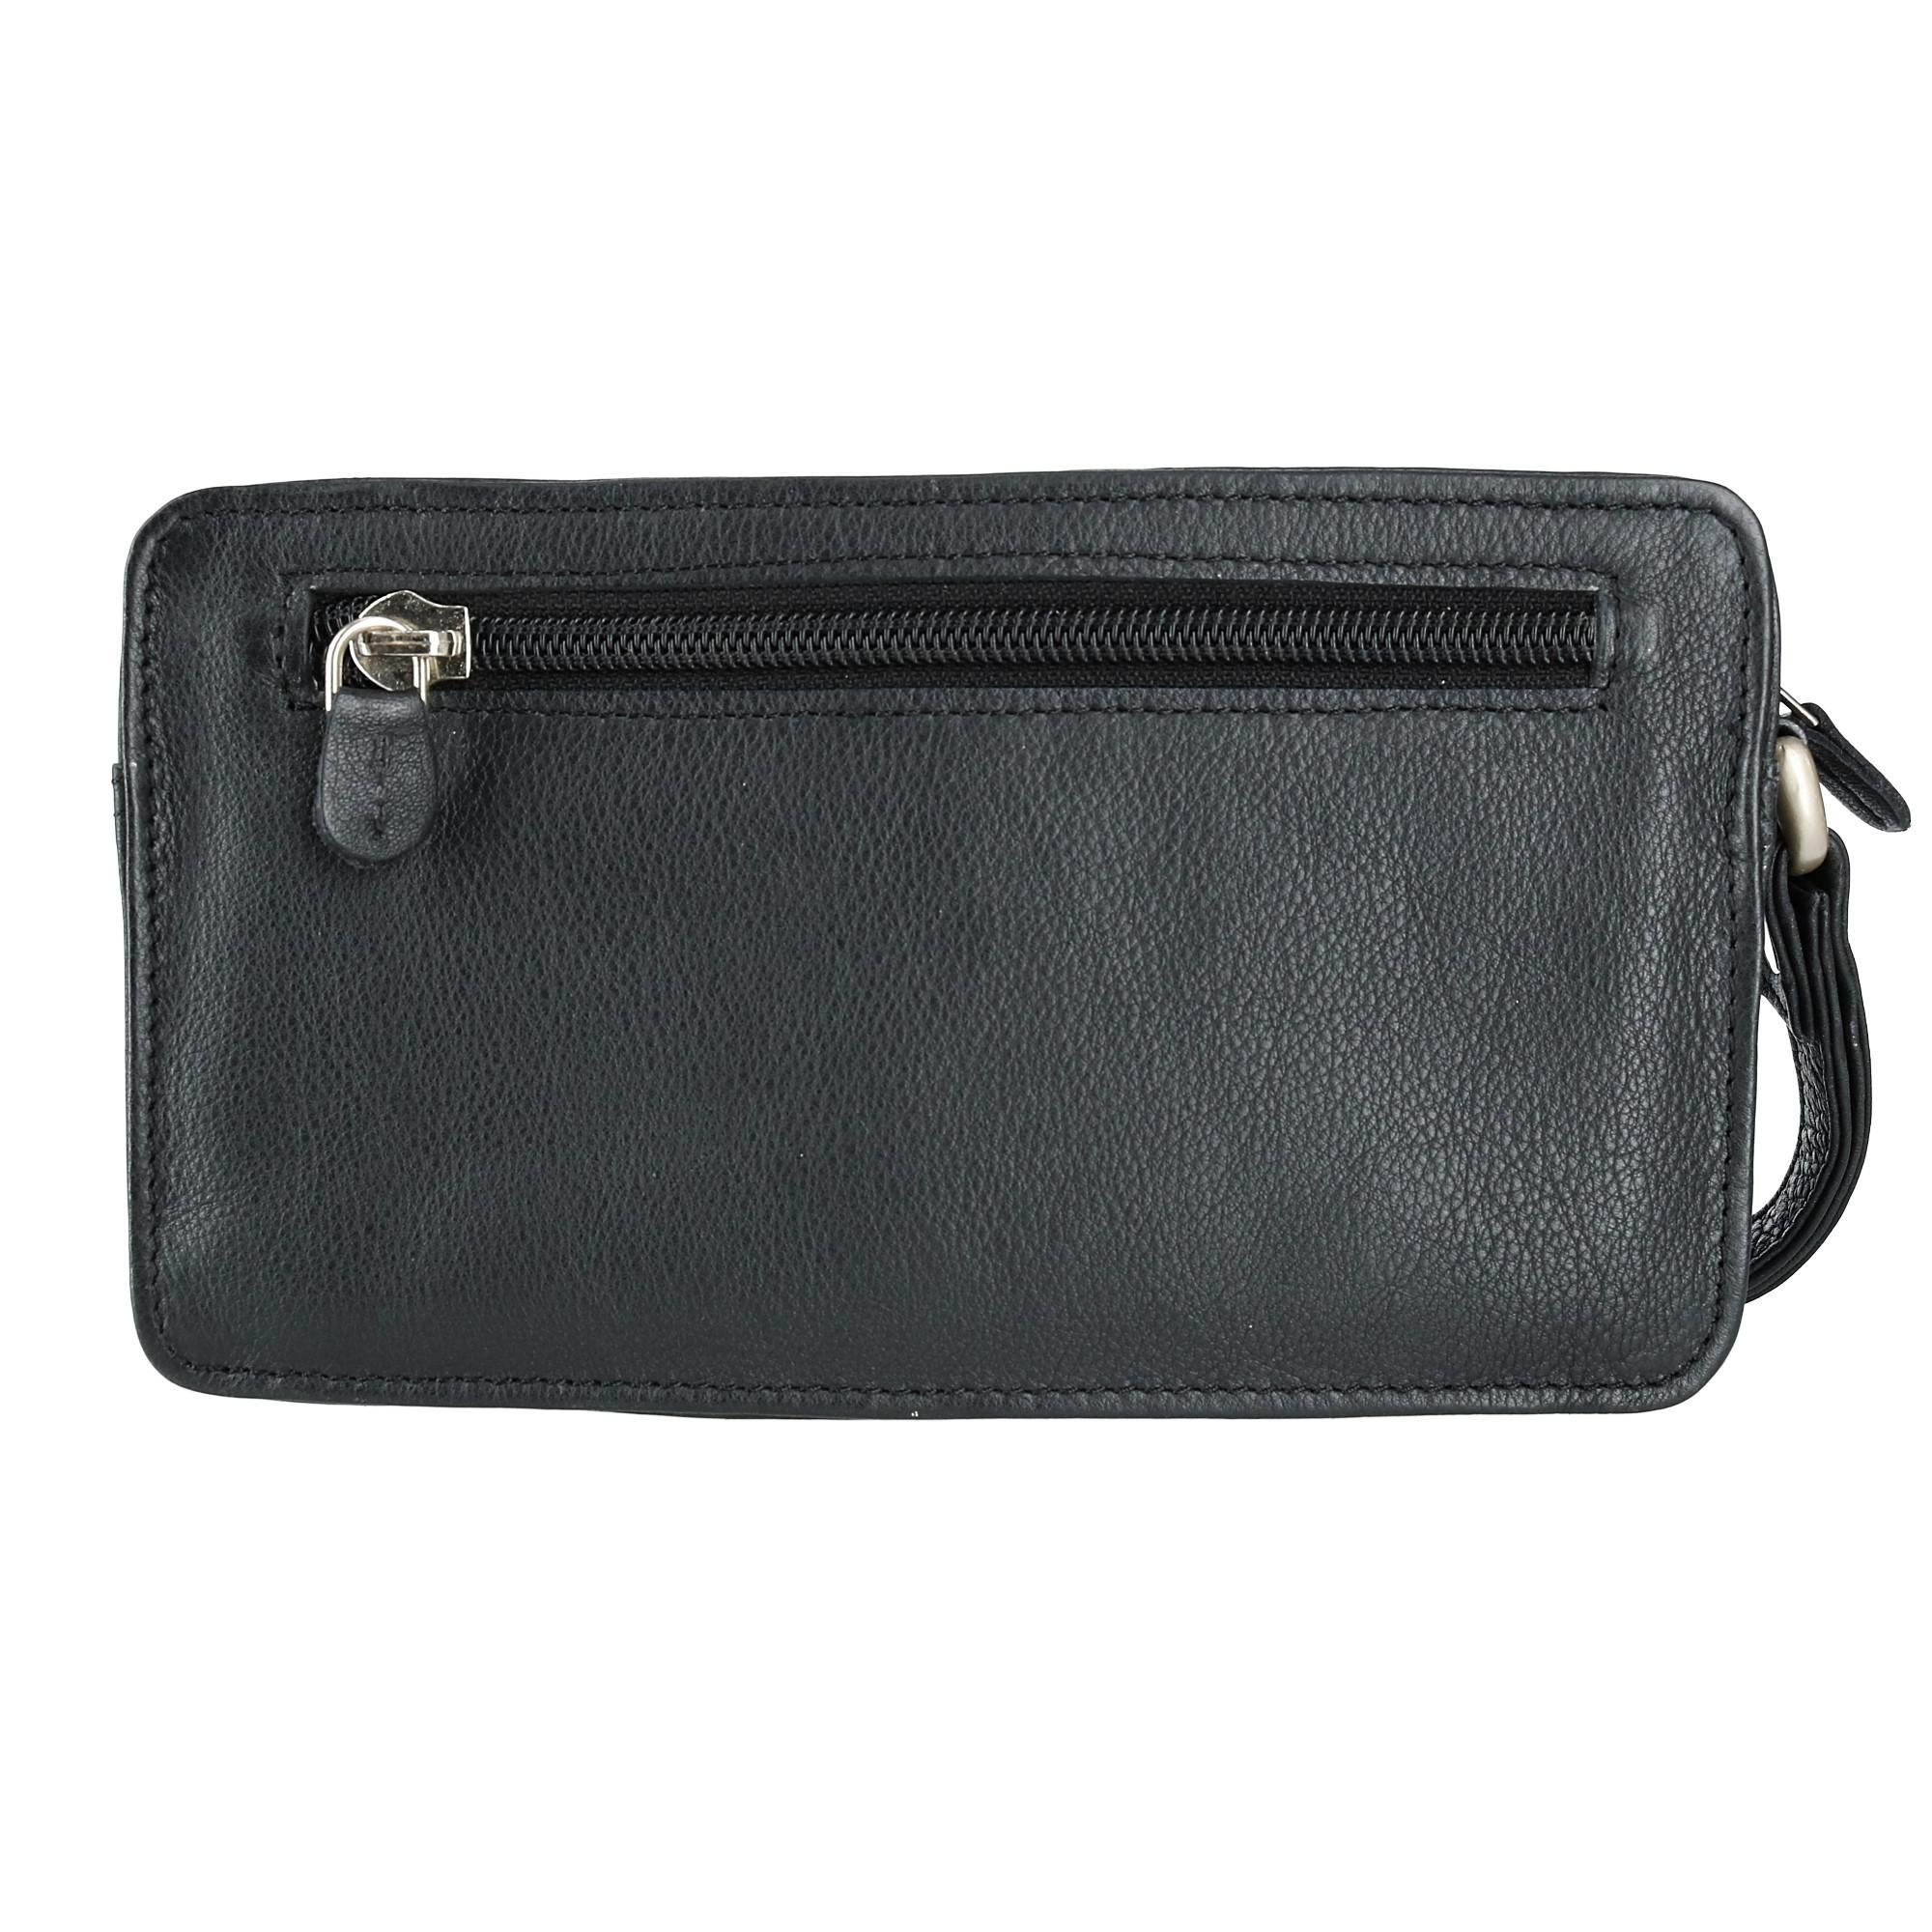 OMNIA -Black MB703M MEN/'S GENUINE LEATHER Clutch Bag Wrist